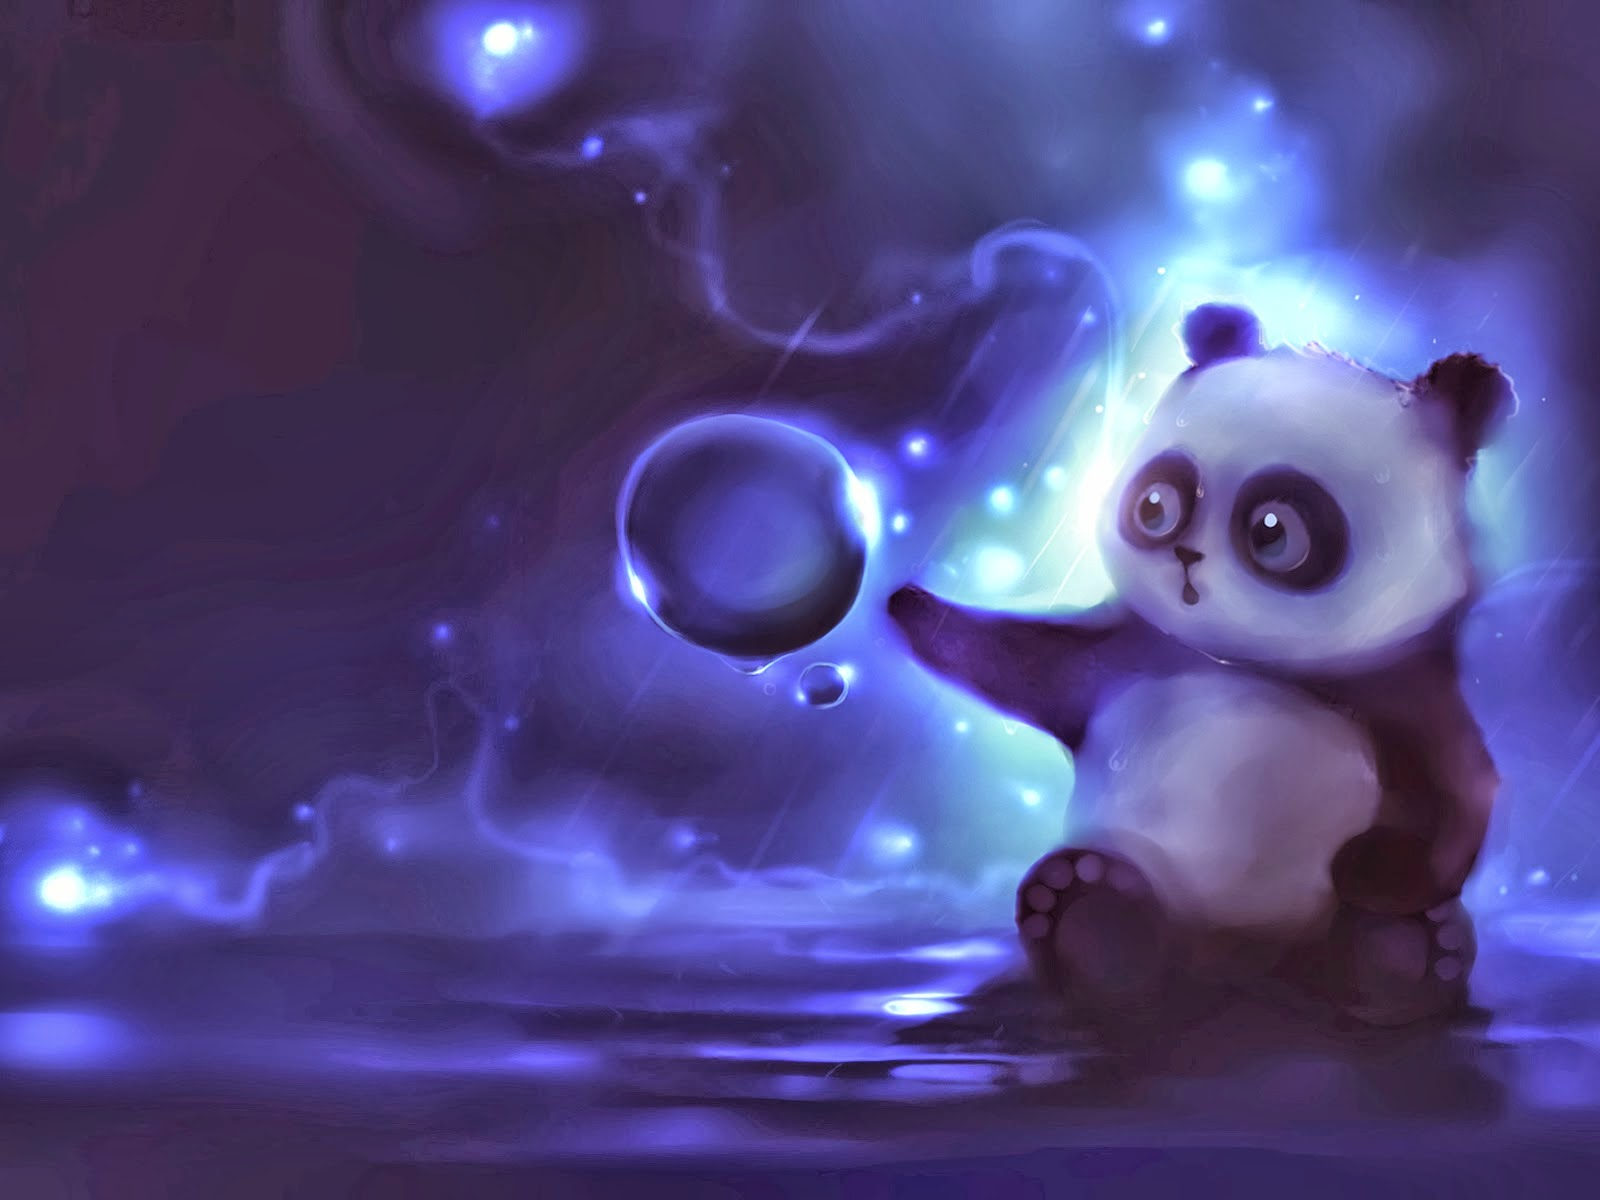 Hd Cute Panda Wallpaper Bonitas Imagenes Para Fondo De Pantalla Imagenes De Amor